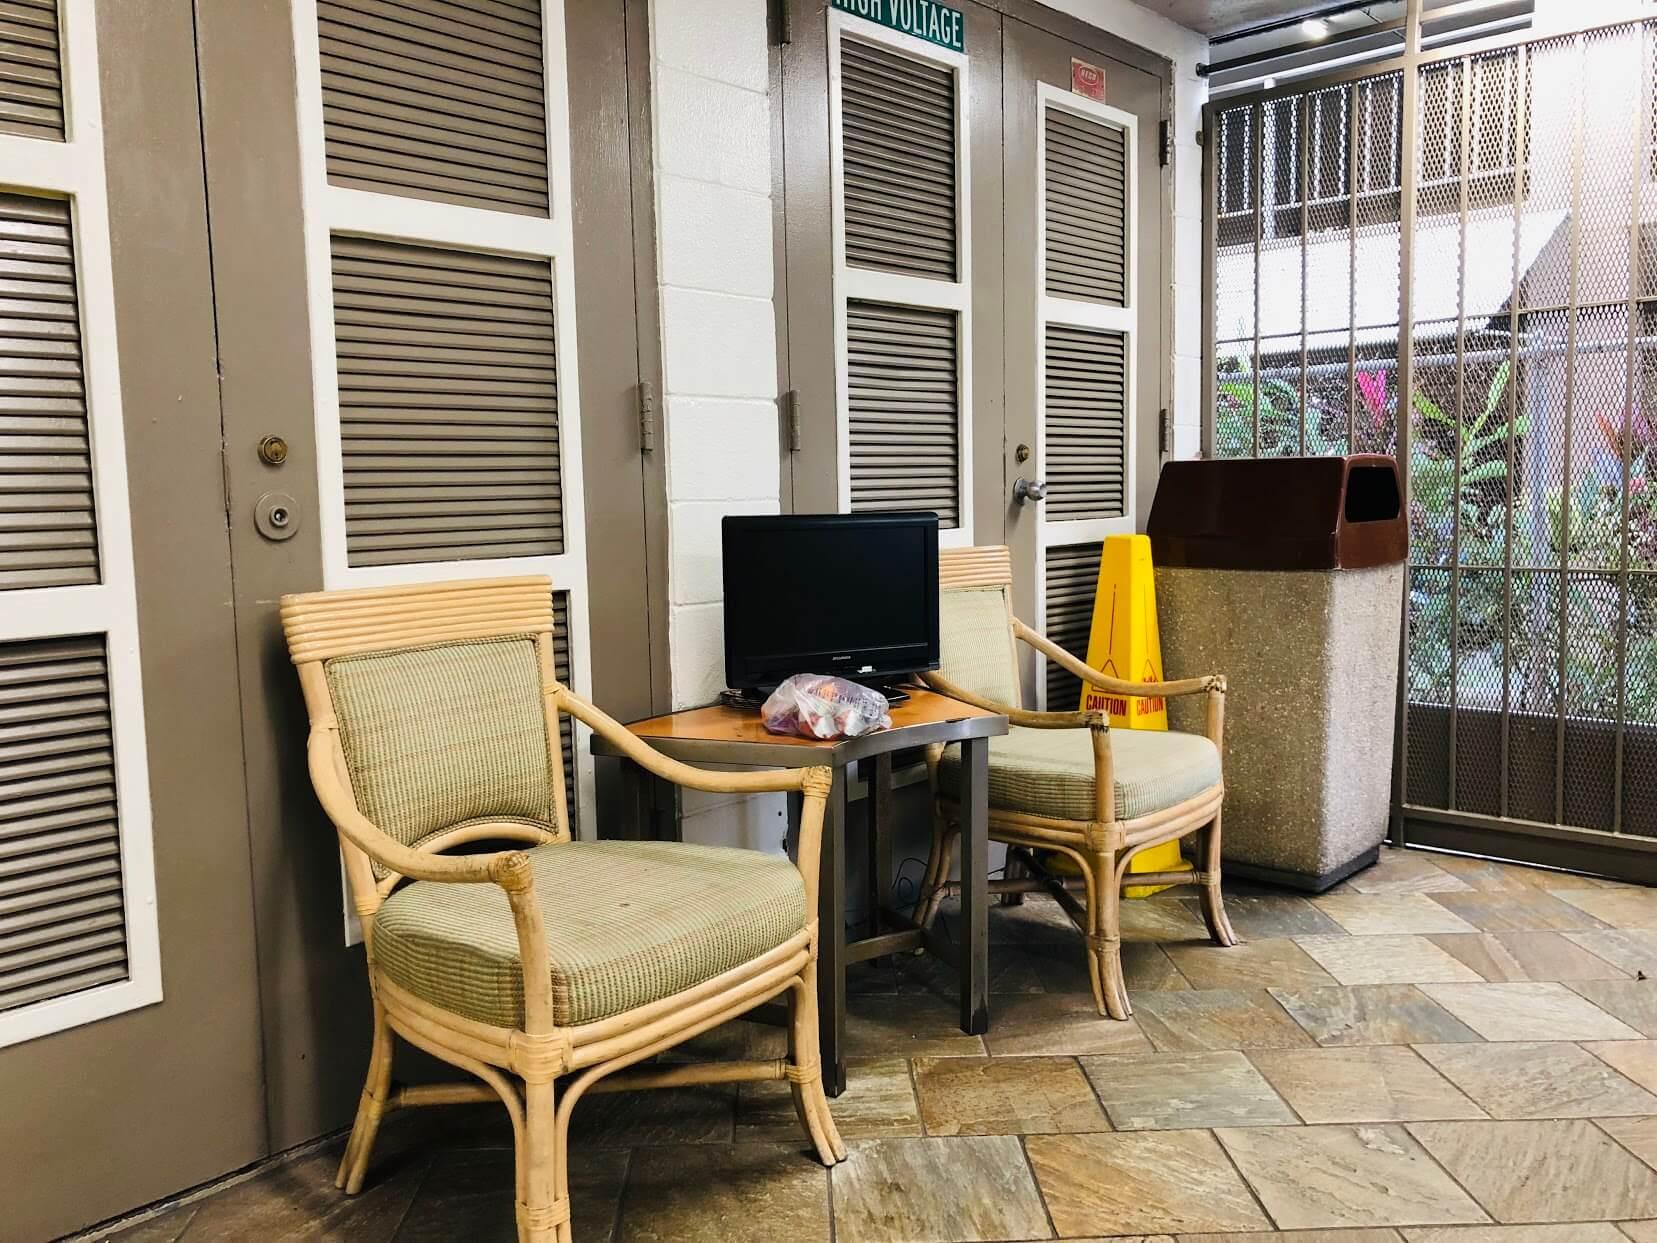 Ala Wai Town Houseの椅子